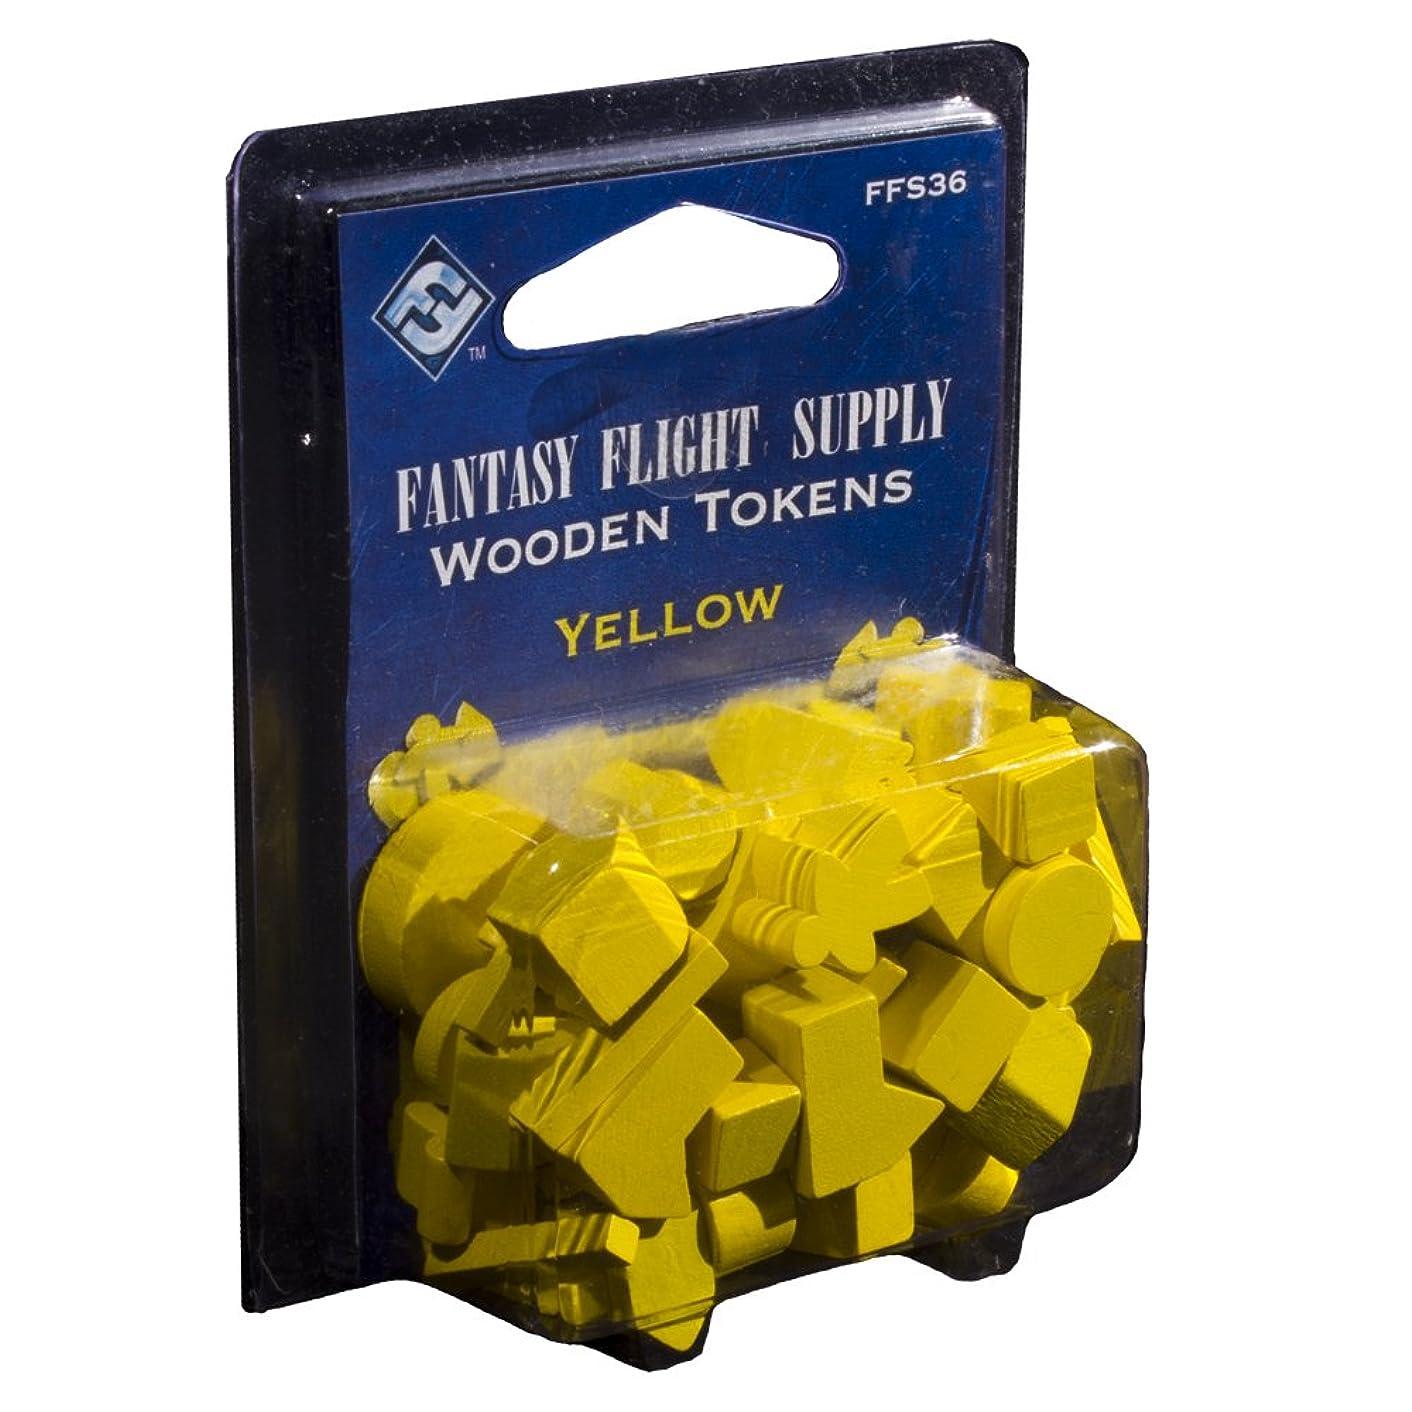 Fantasy Flight Supply: Wood Tokens - Yellow